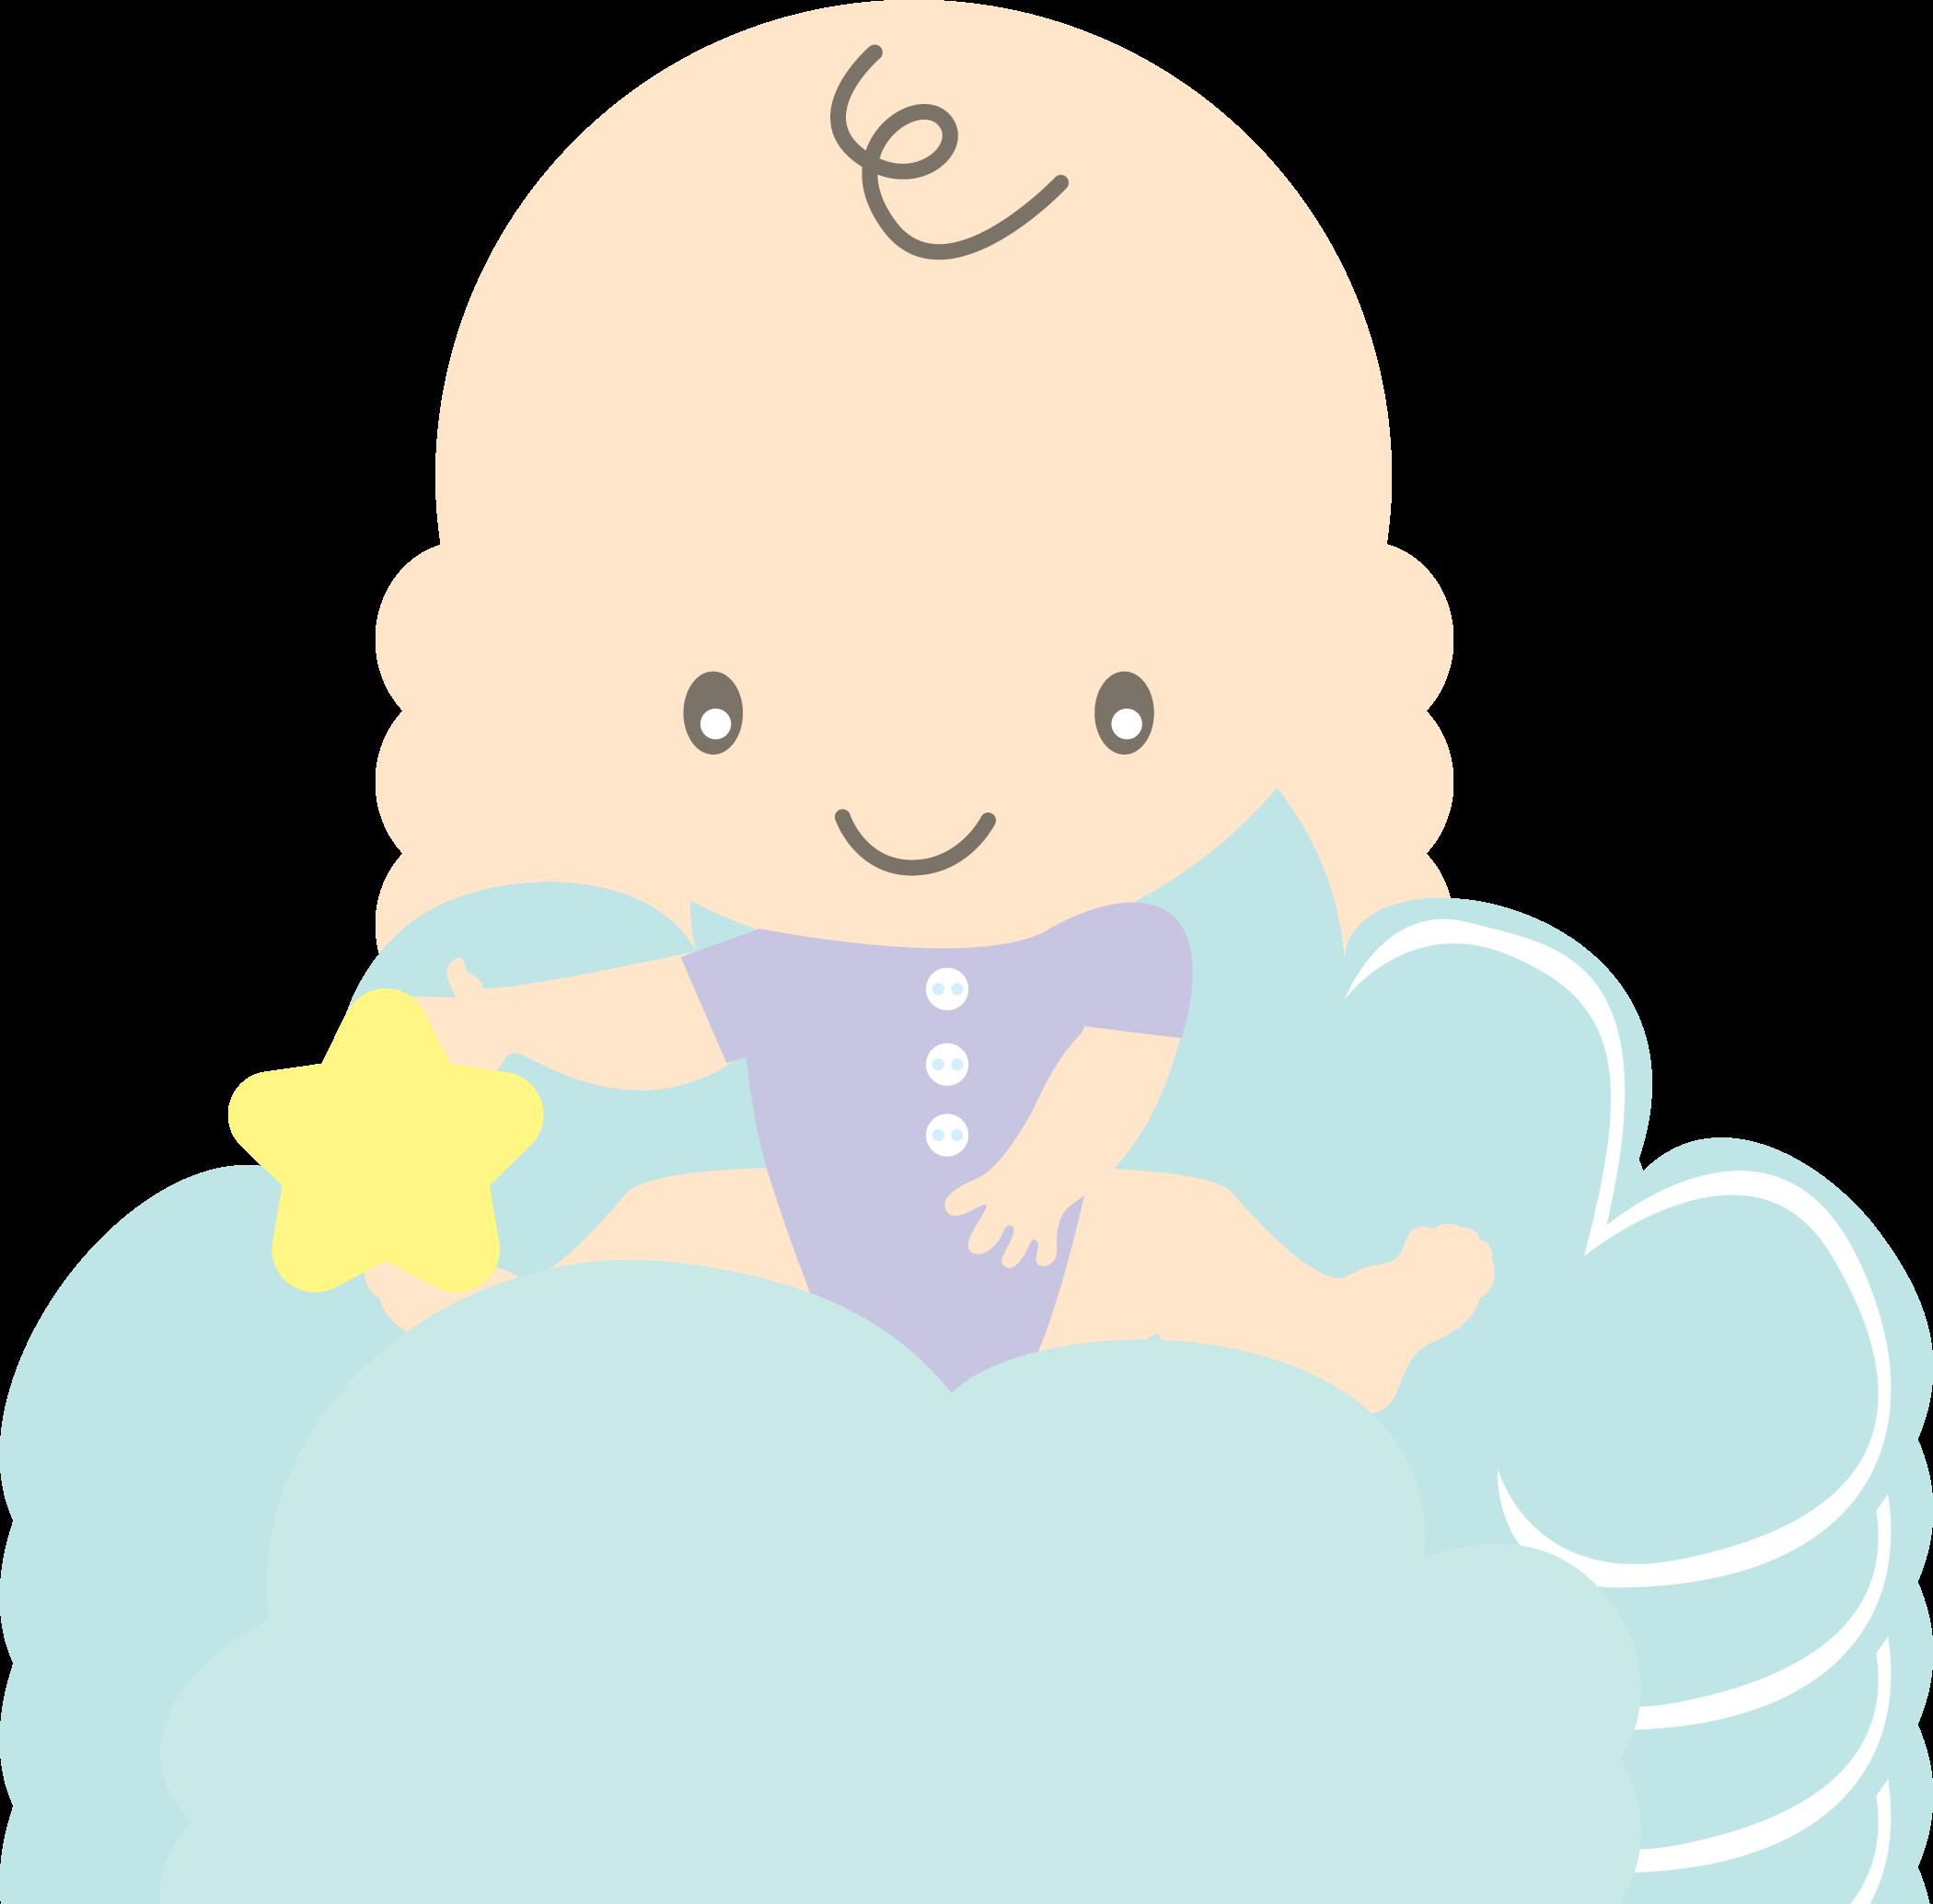 Snowflake baby shower clipart free Photo by @daniellemoraesfalcao - Minus | BB dibujos, fondos, clipart ... free